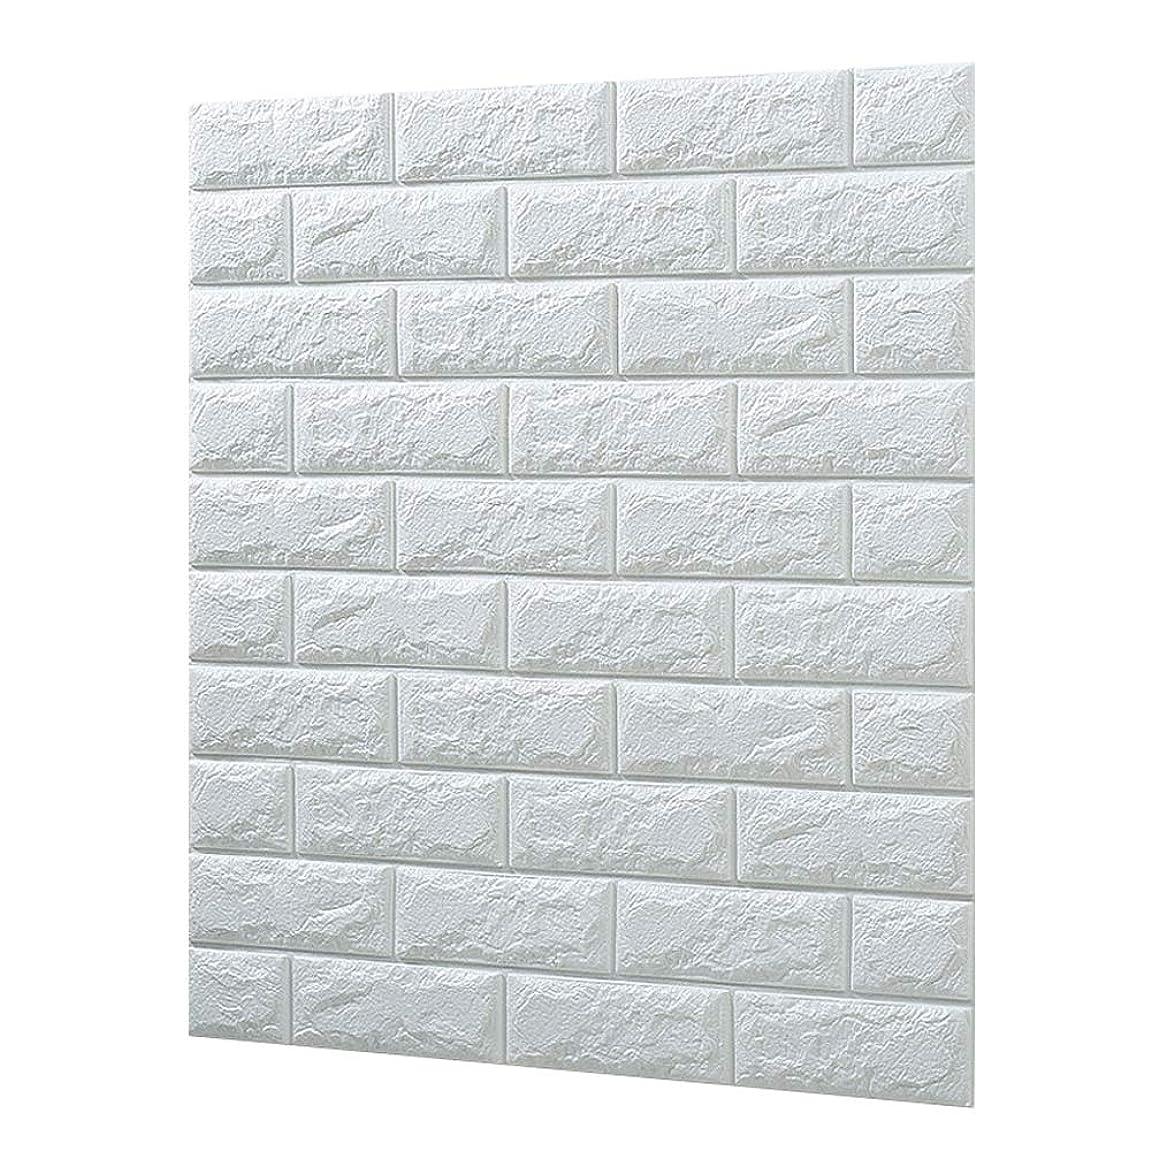 3D立体壁紙 DIYレンガ調壁紙シール 70x77CM ウォールステッカー 軽量レンガシール 壁紙シール 自己粘着 防水 多色選択 (70*77cm(1枚入れ), パールホワイト)